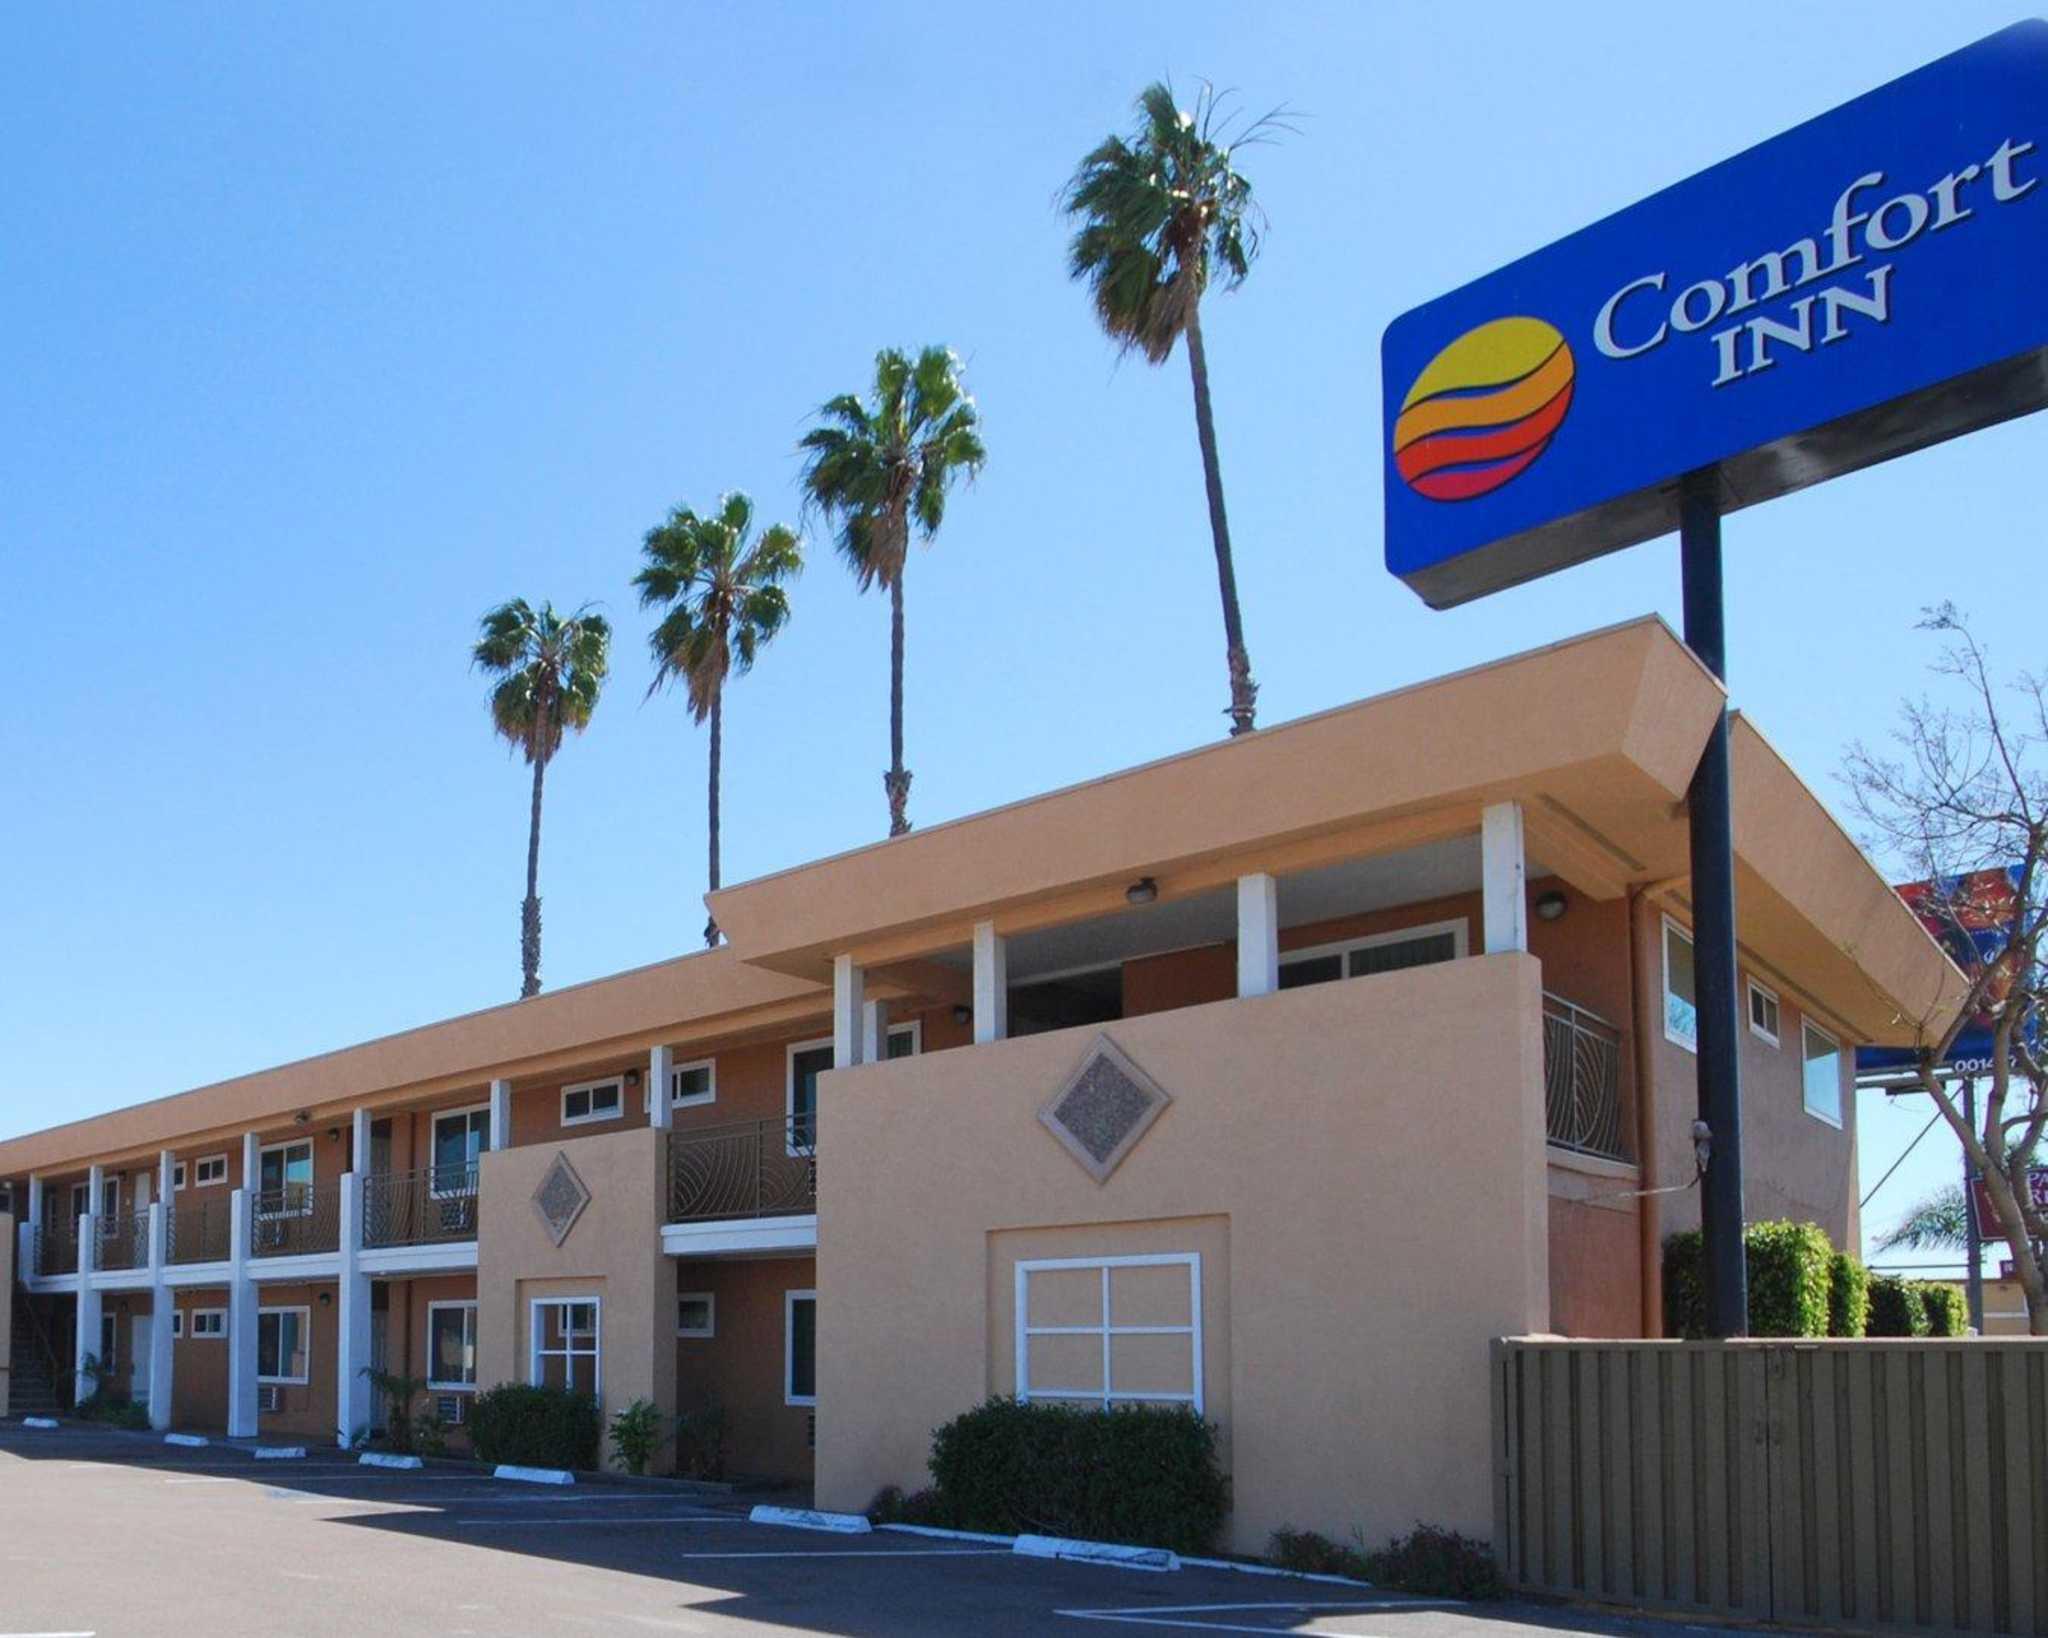 Comfort Inn San Diego At The Harbor image 2